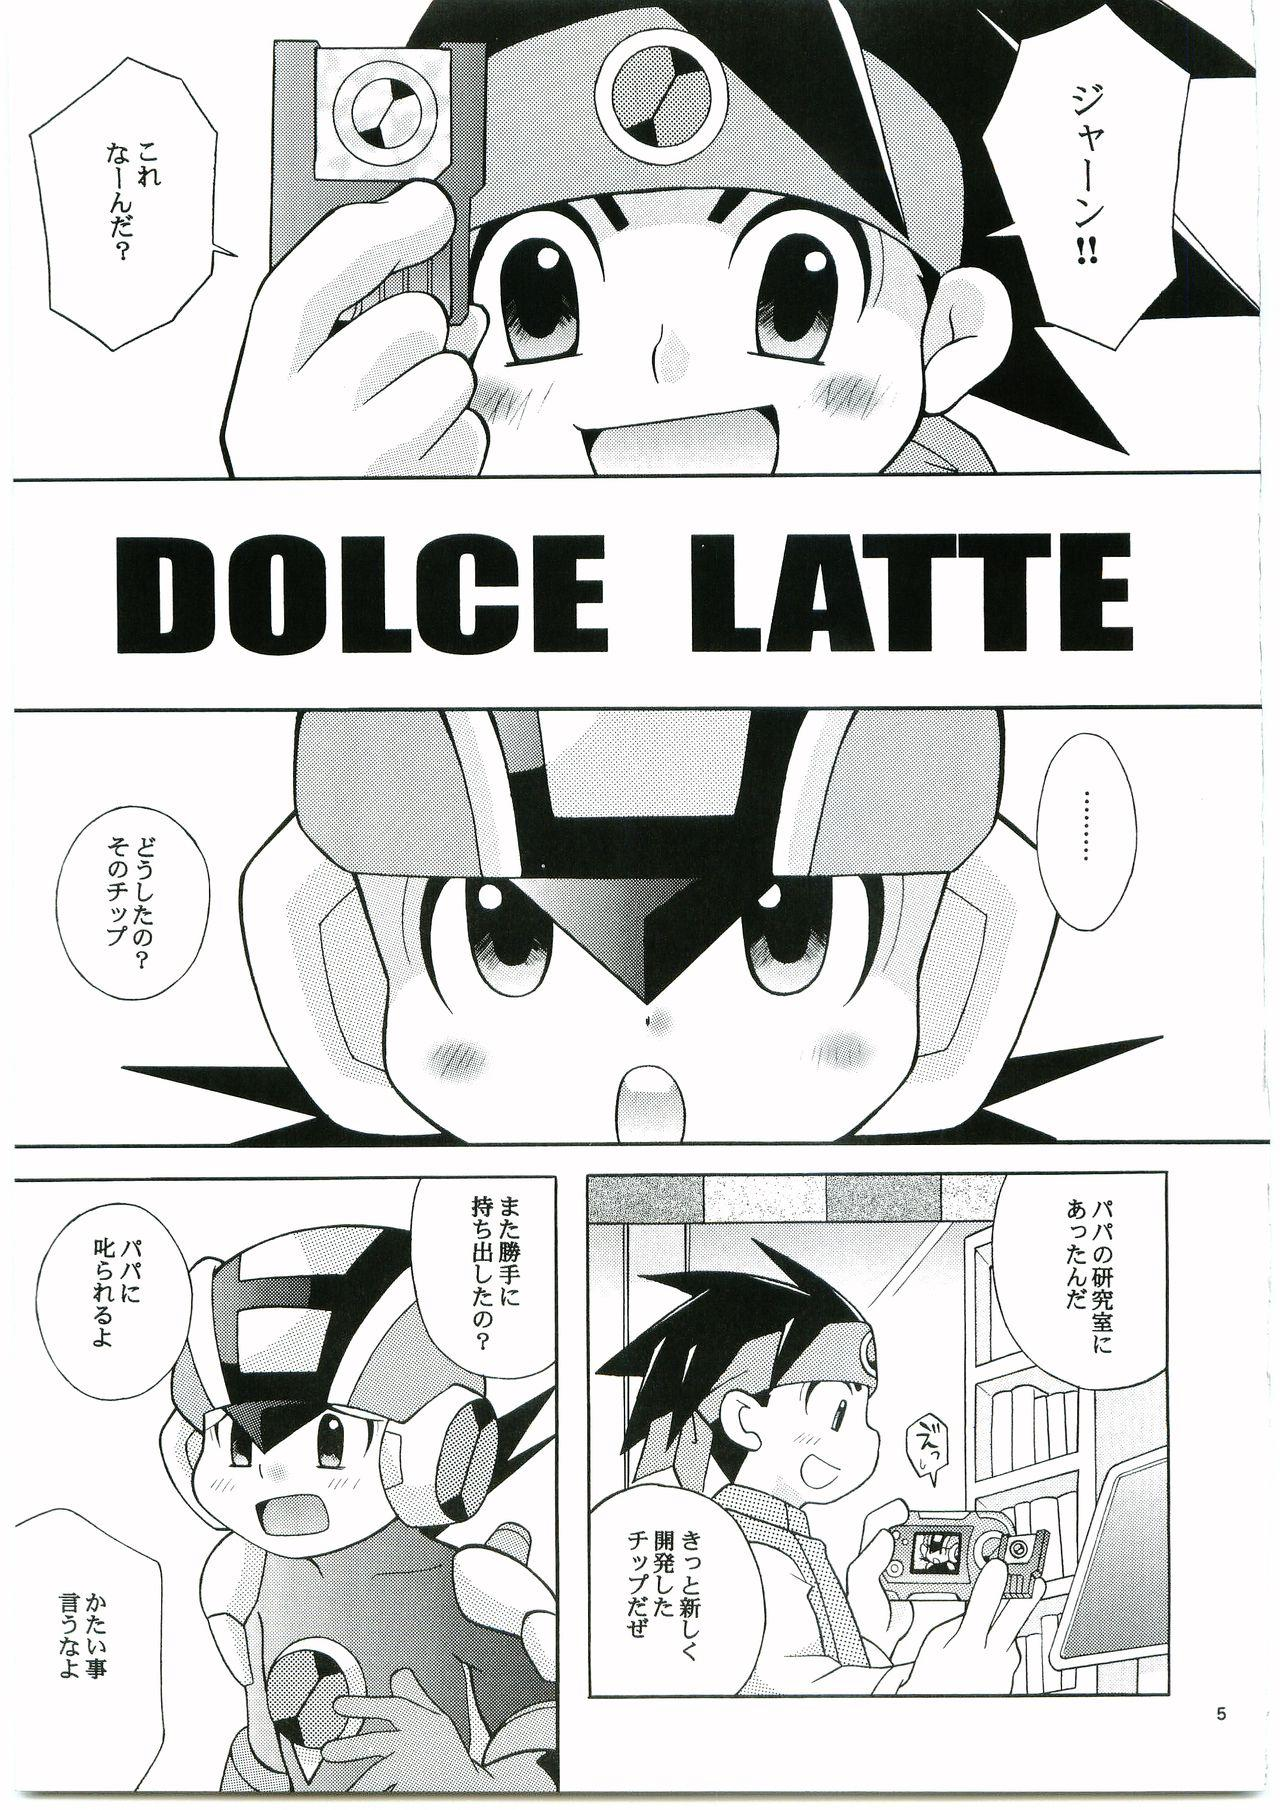 DOLCE LATTE 3